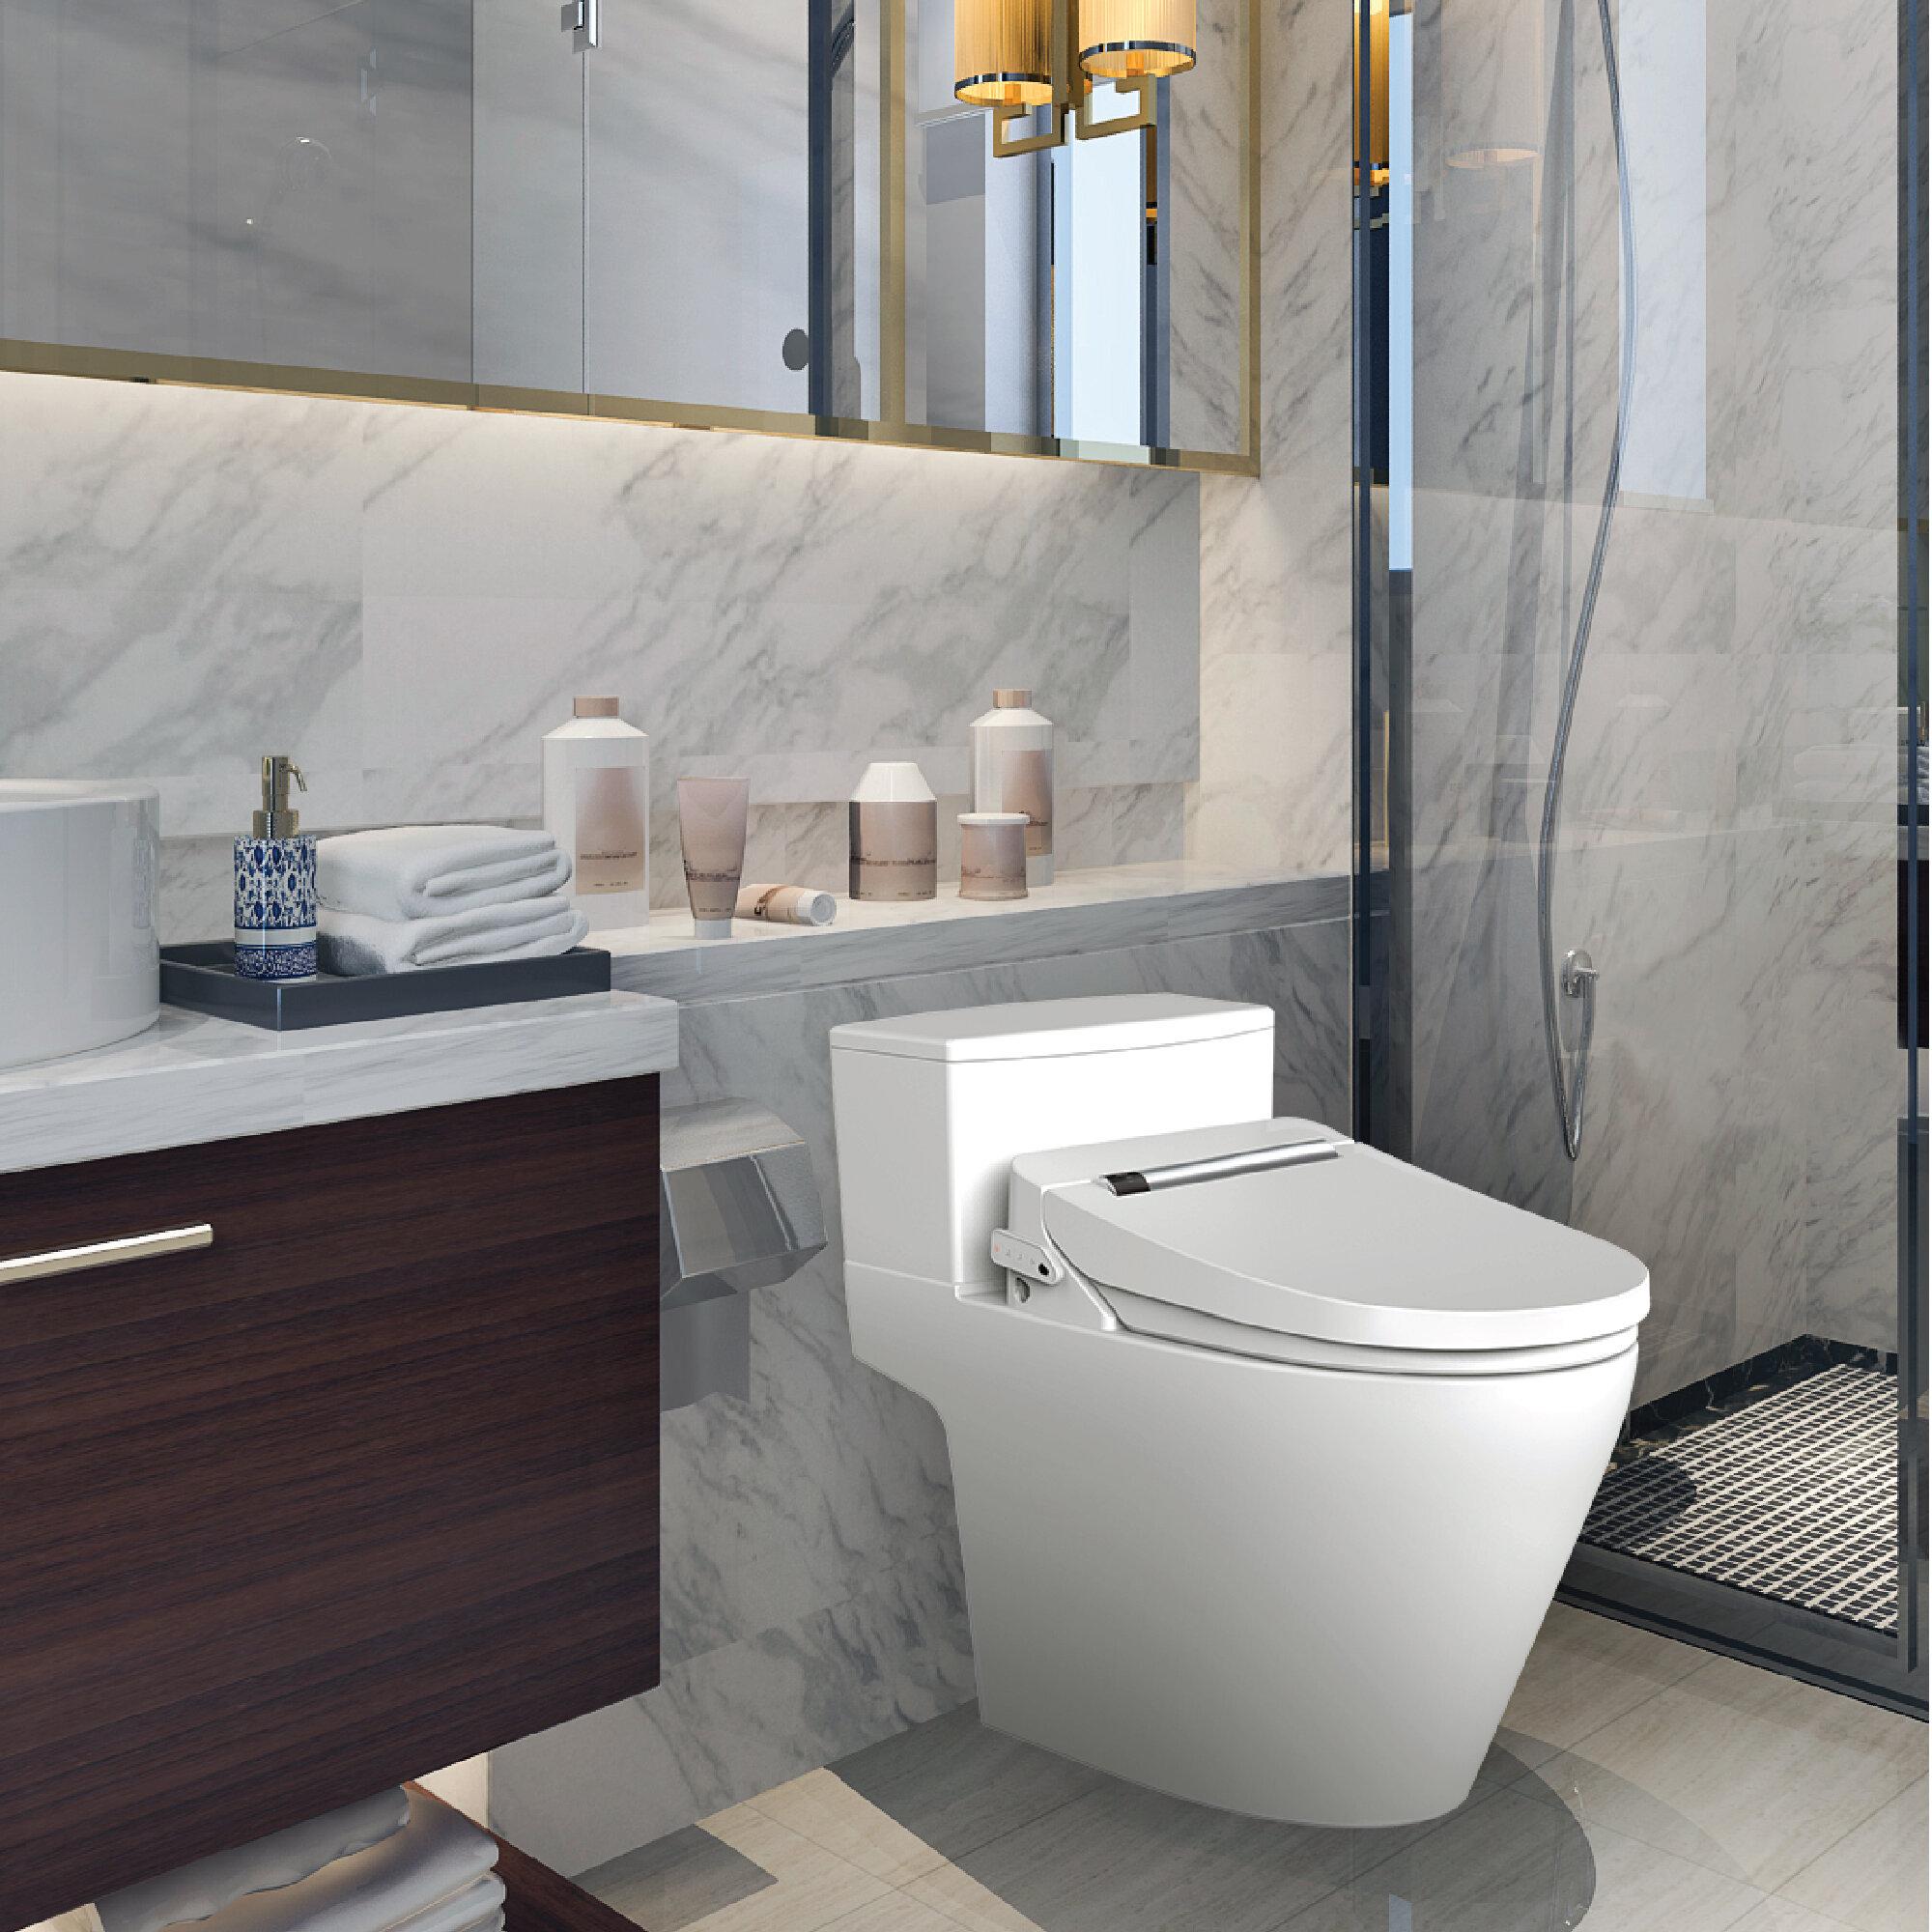 Temperature Spray Bathroom Toilet Bidet Seat Water Shattaf Shower Head